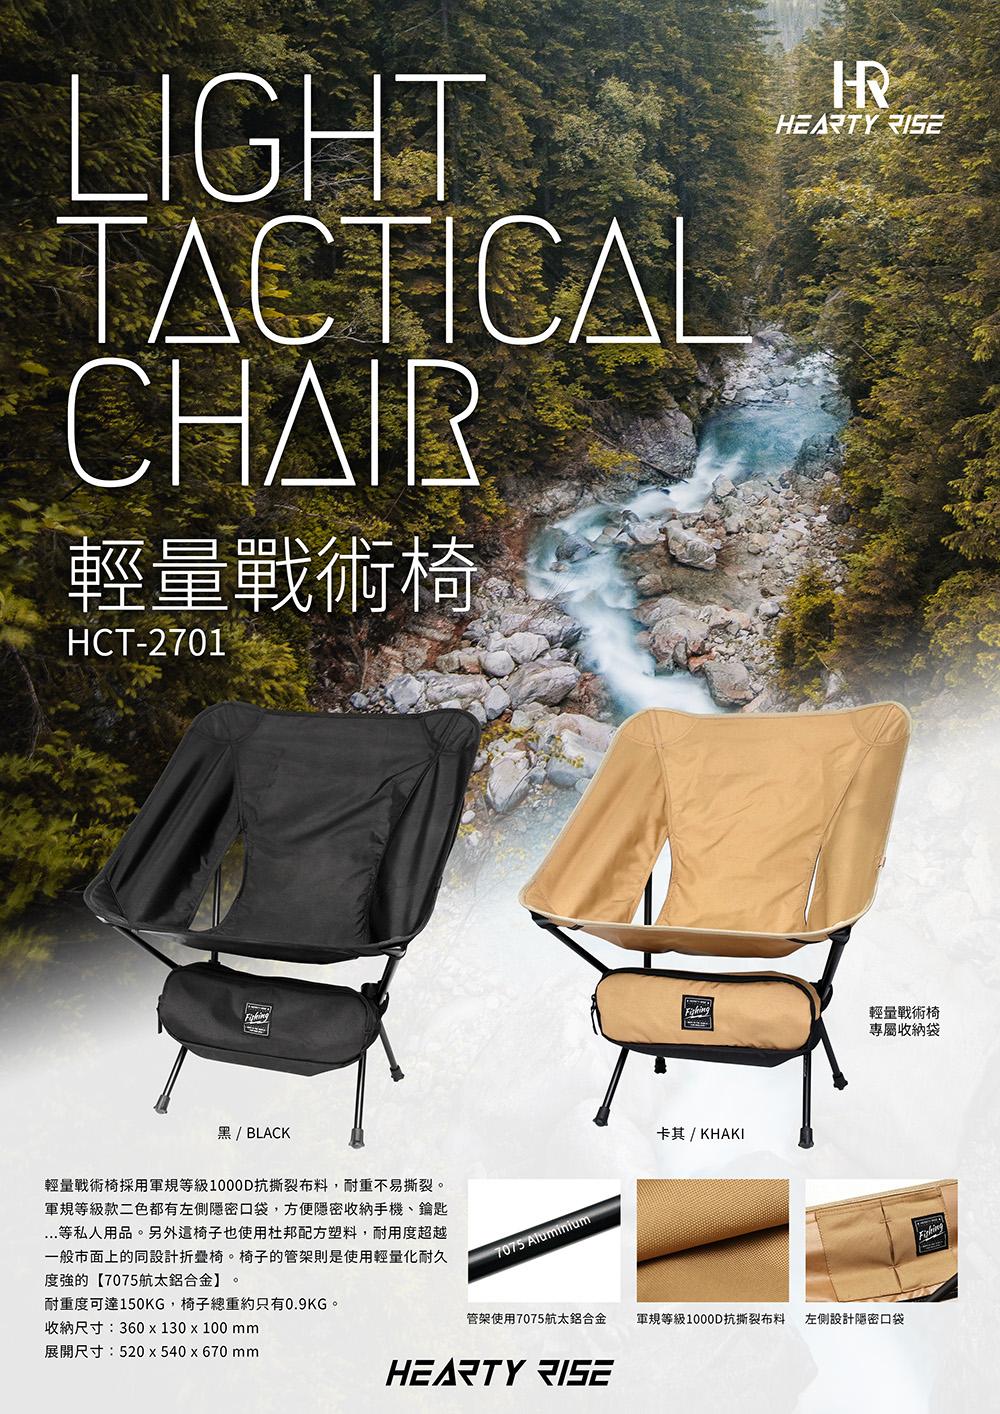 HR 輕量戰術椅 HCT-2701 1000